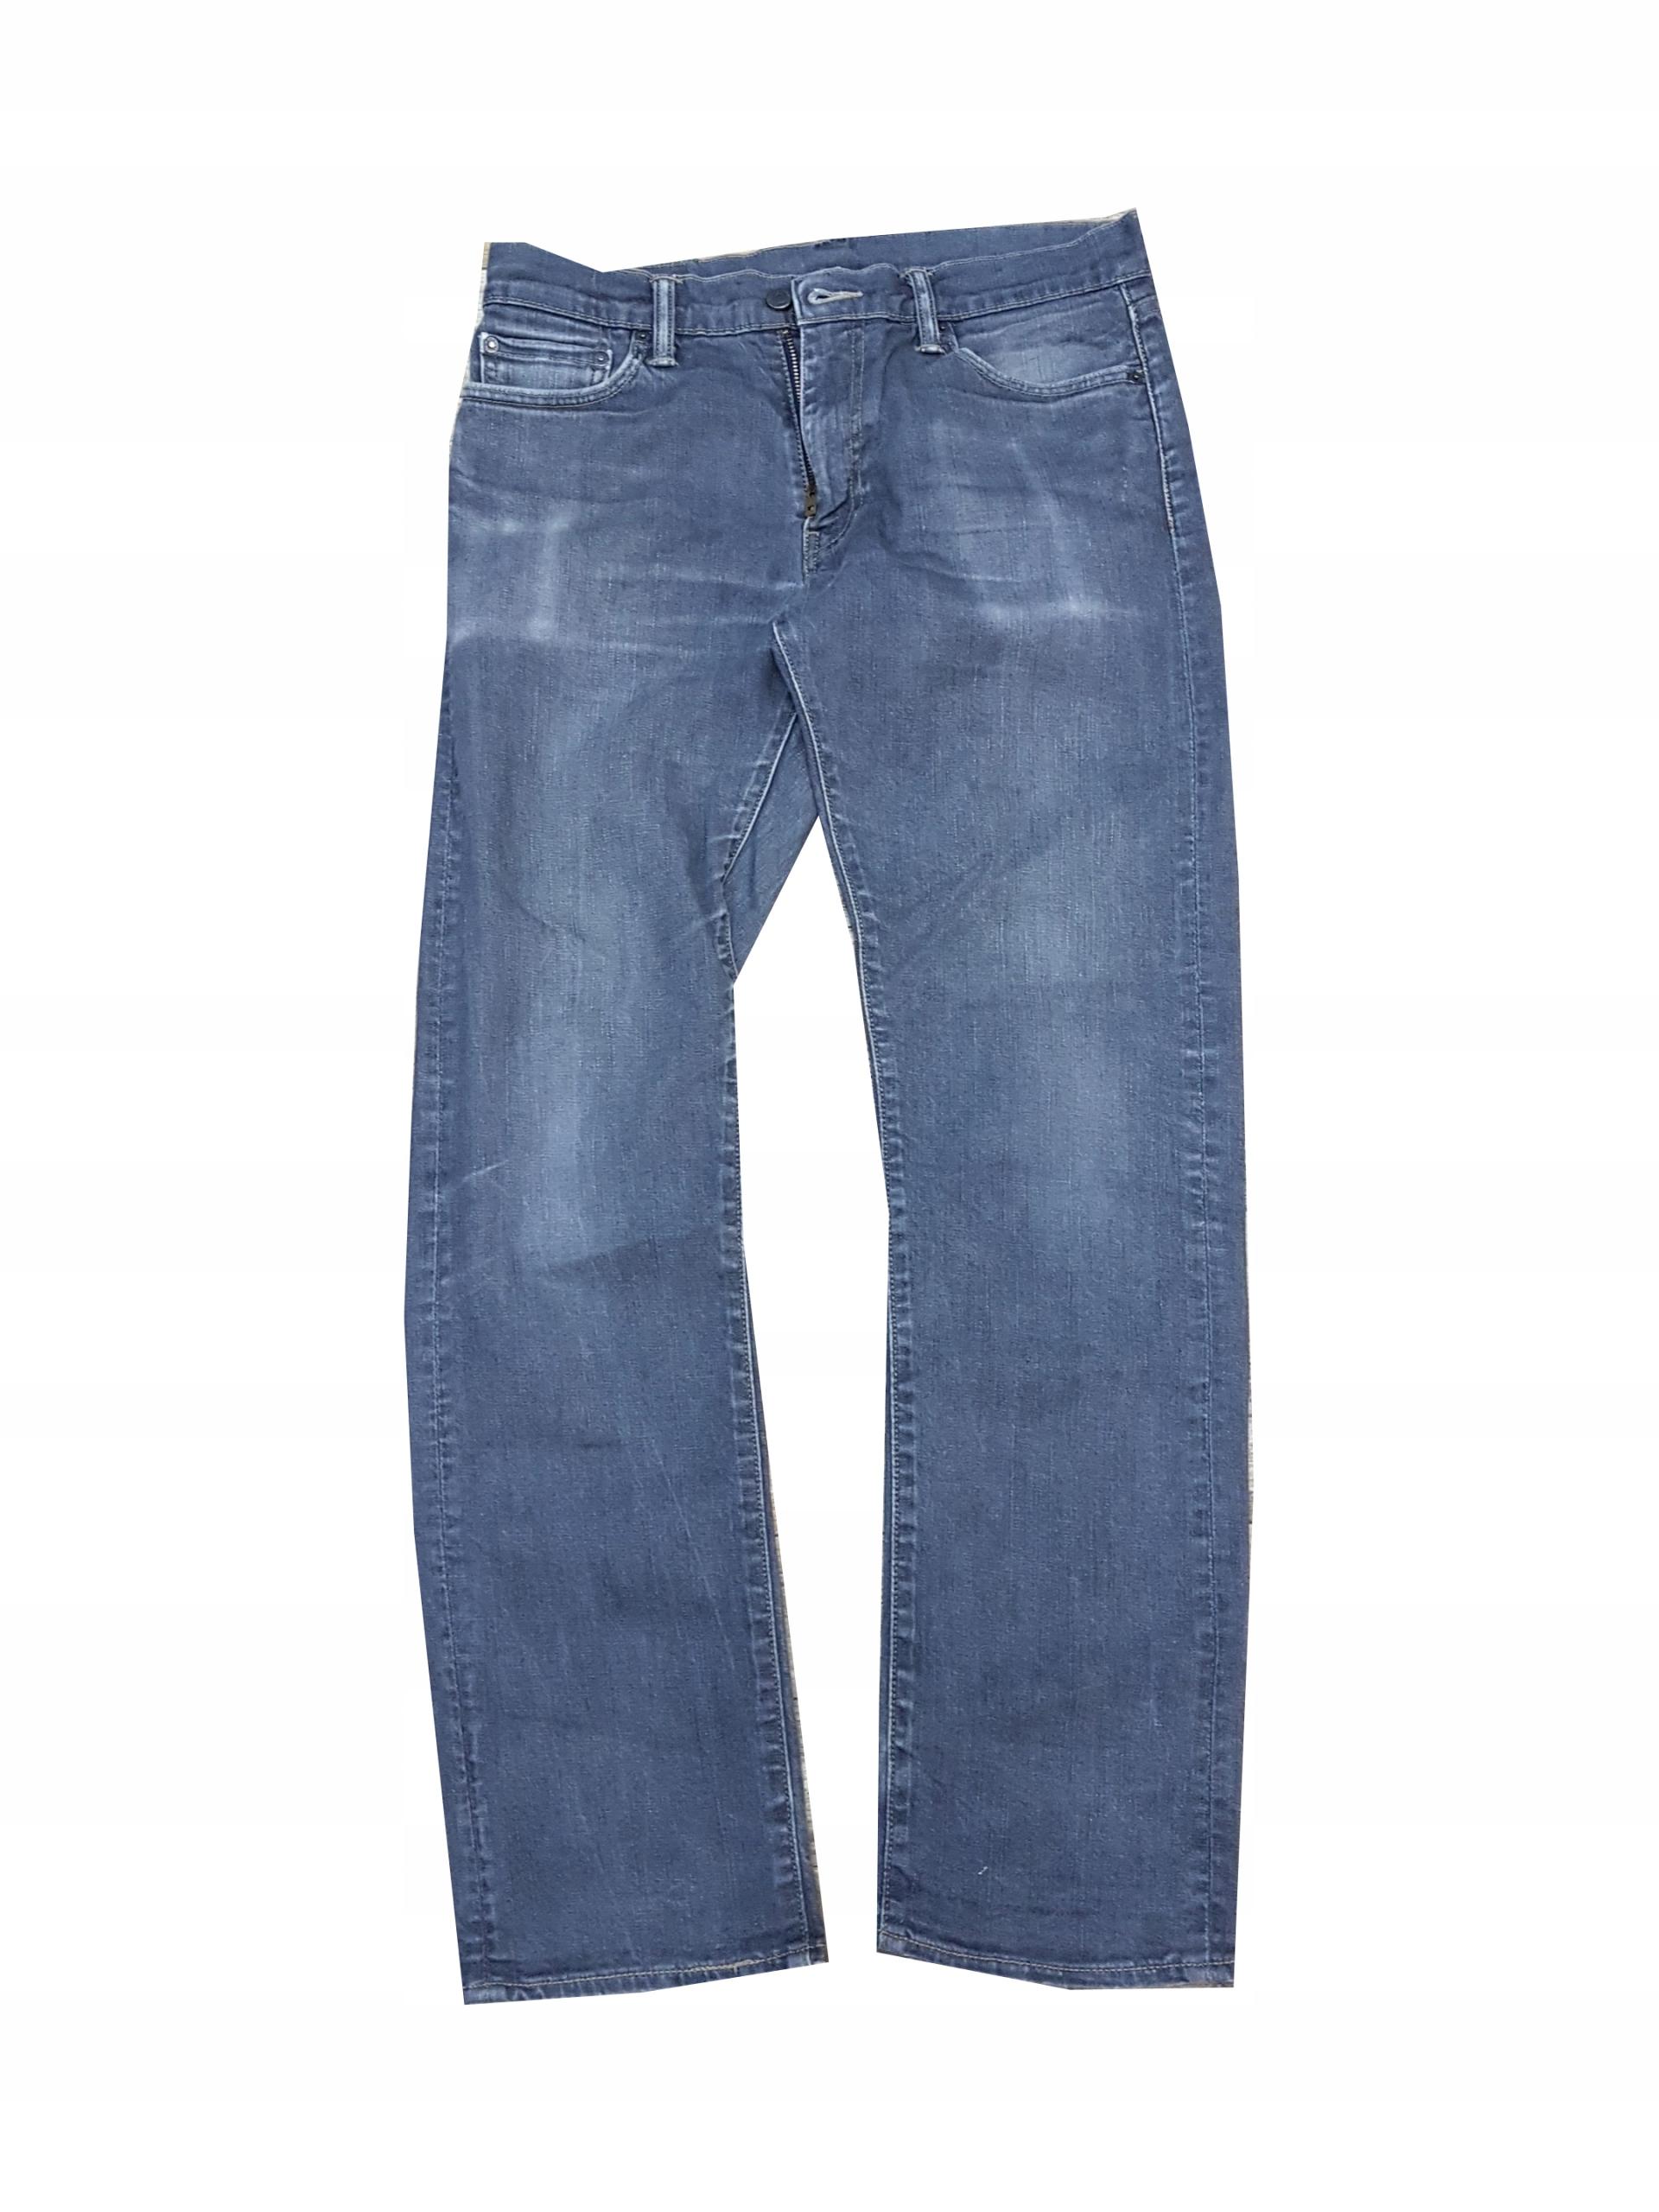 LEVI'S Levis 504 Spodnie Jeansy 33/32 pas 85 cm